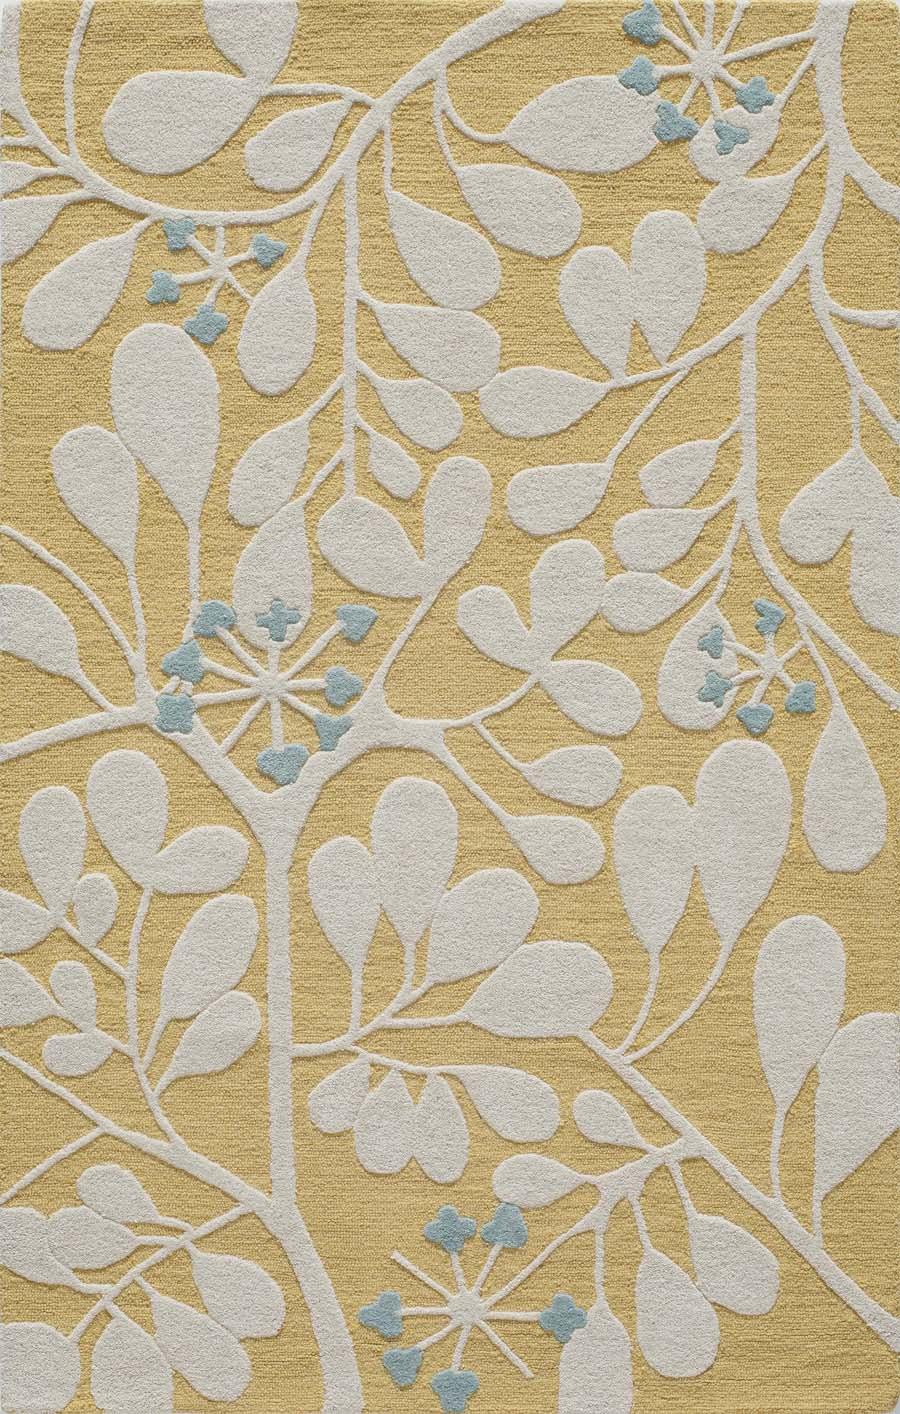 Momeni dunes dun10 gold rug for Momeni rugs